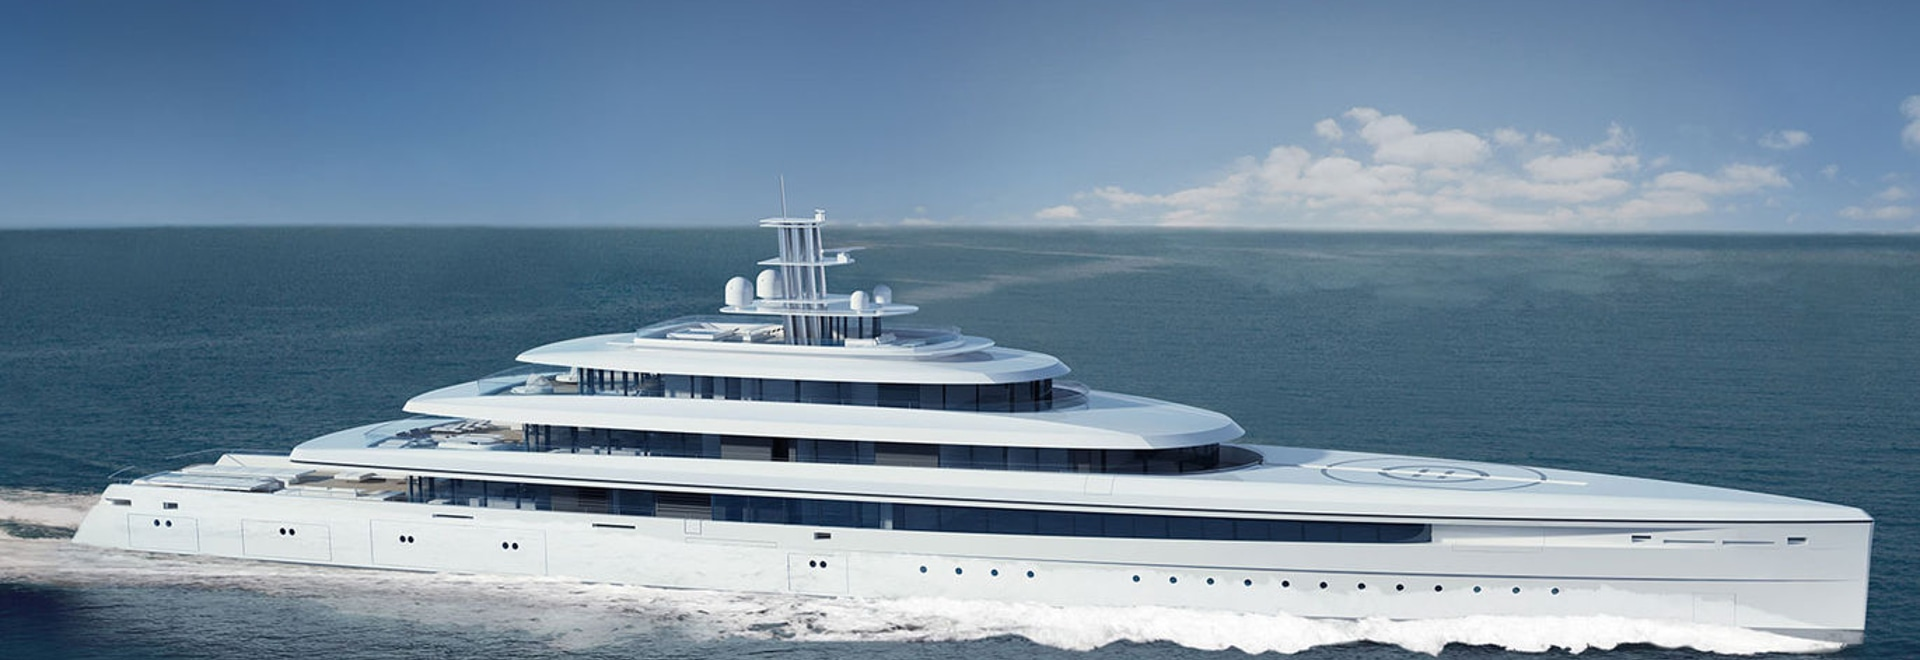 NEW Steel Mega Yacht By Oceanco